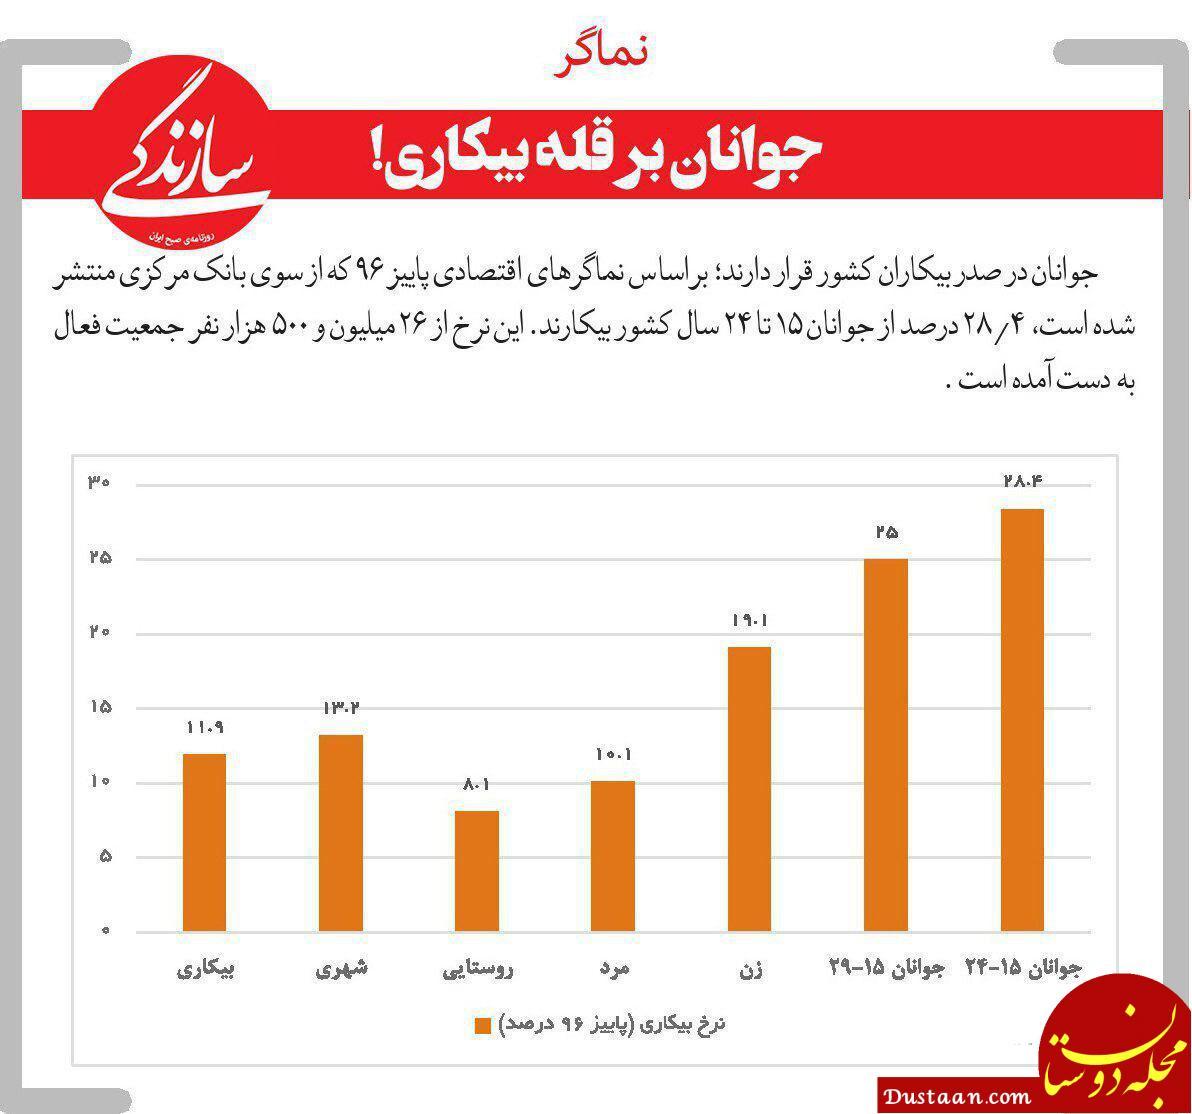 www.dustaan.com جوانان بر قله بیکاری!